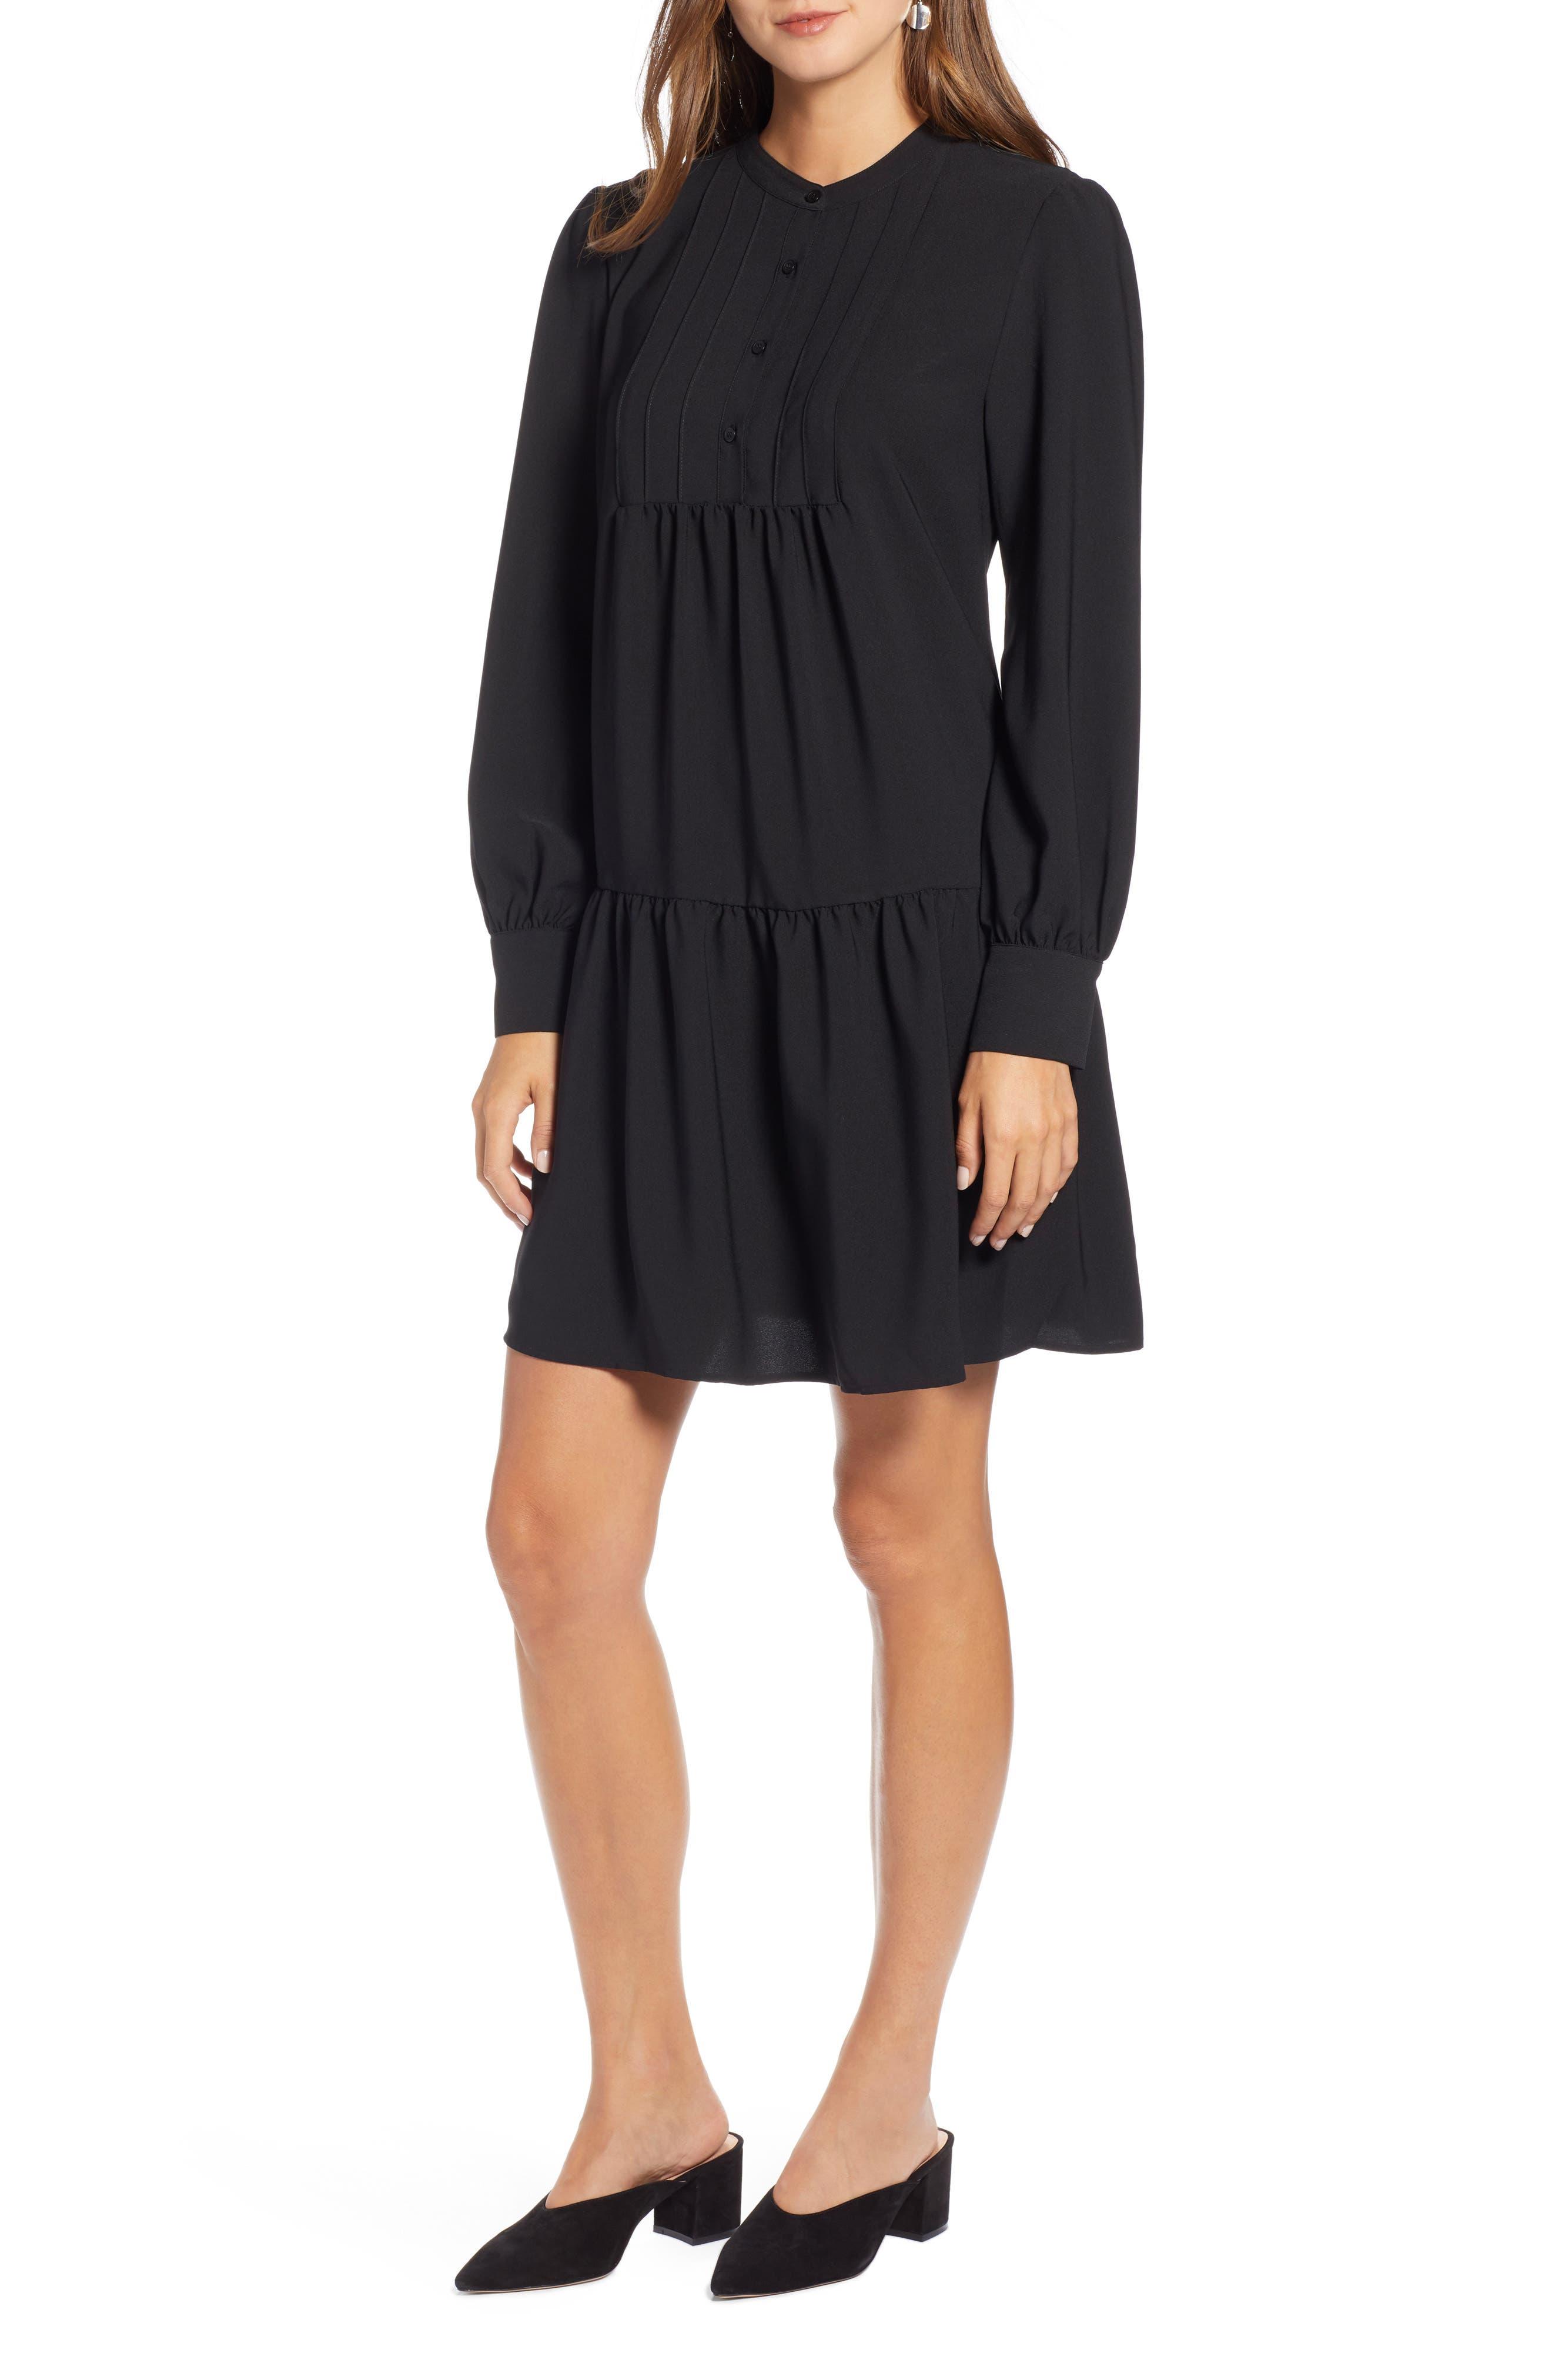 HALOGEN<SUP>®</SUP>, Pintuck Detail Shift Dress, Main thumbnail 1, color, BLACK